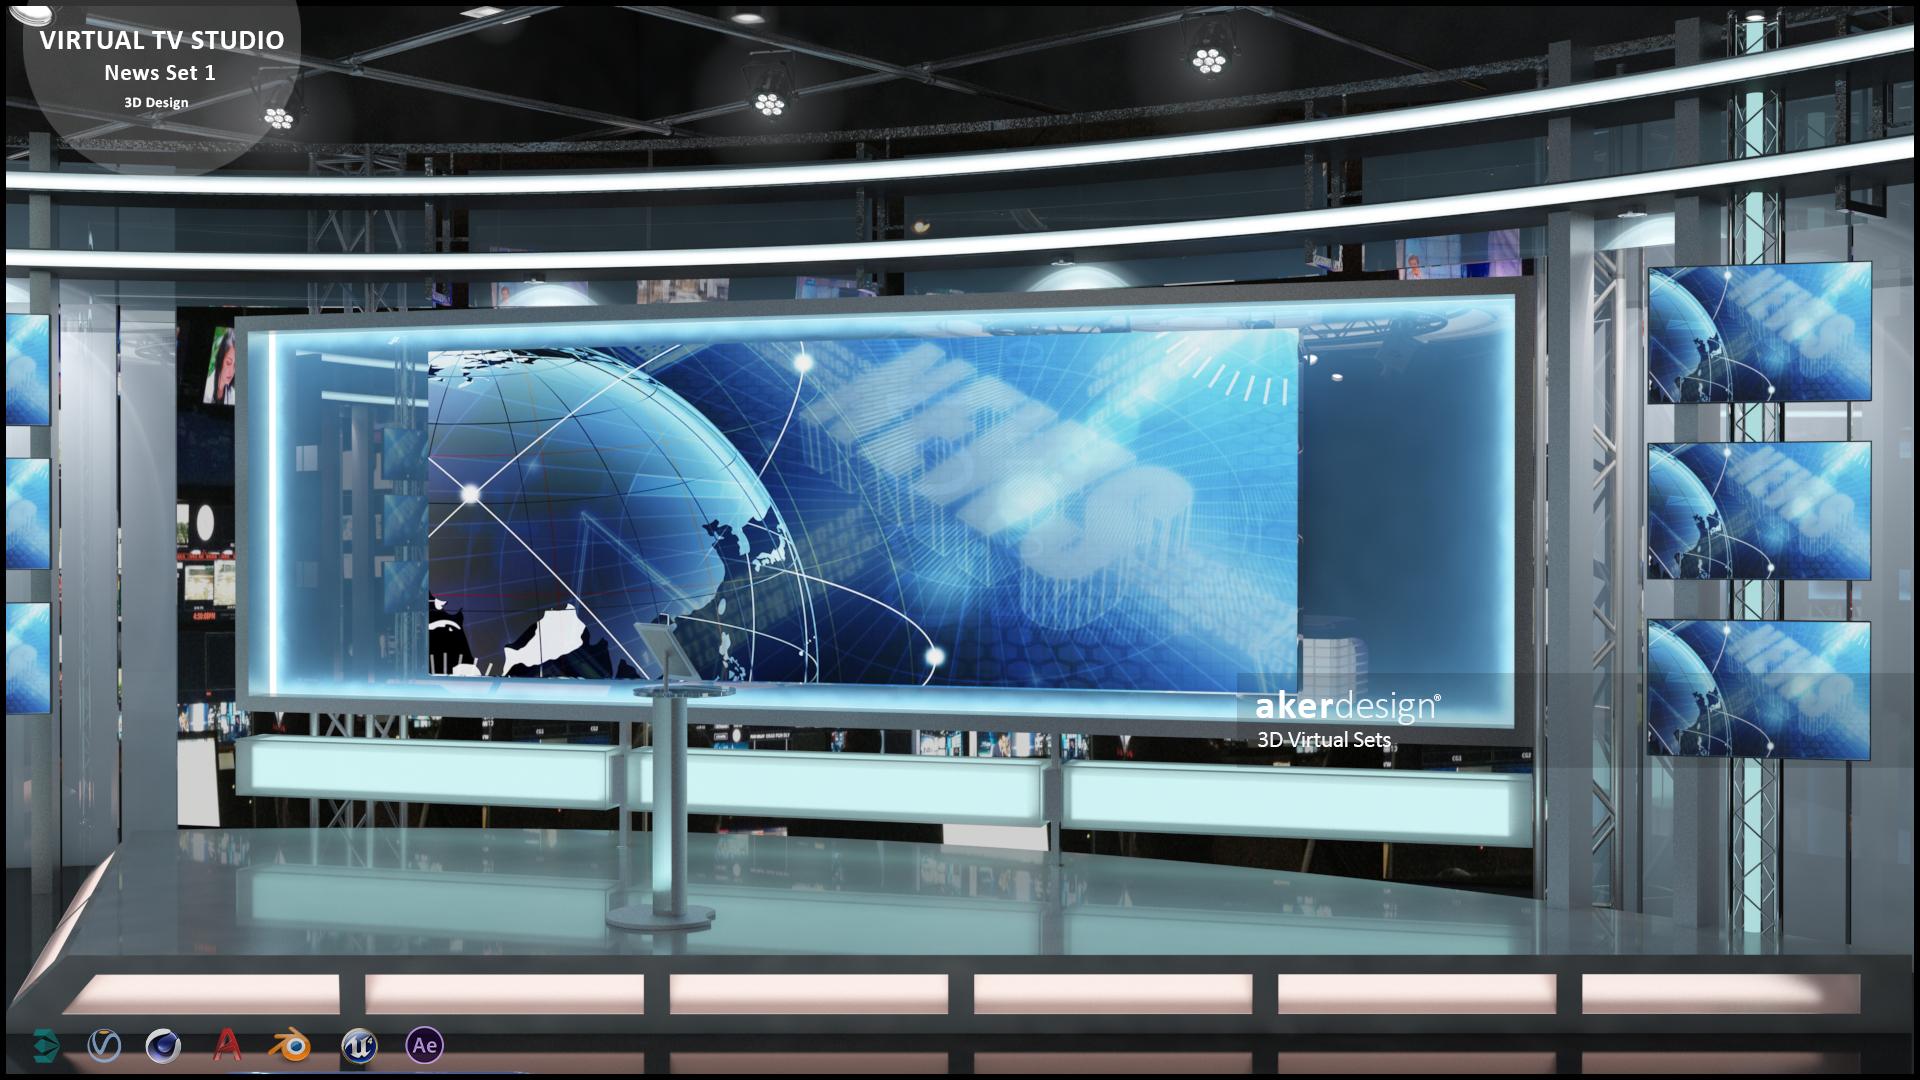 01-NewsSet-1-12-1920x1080